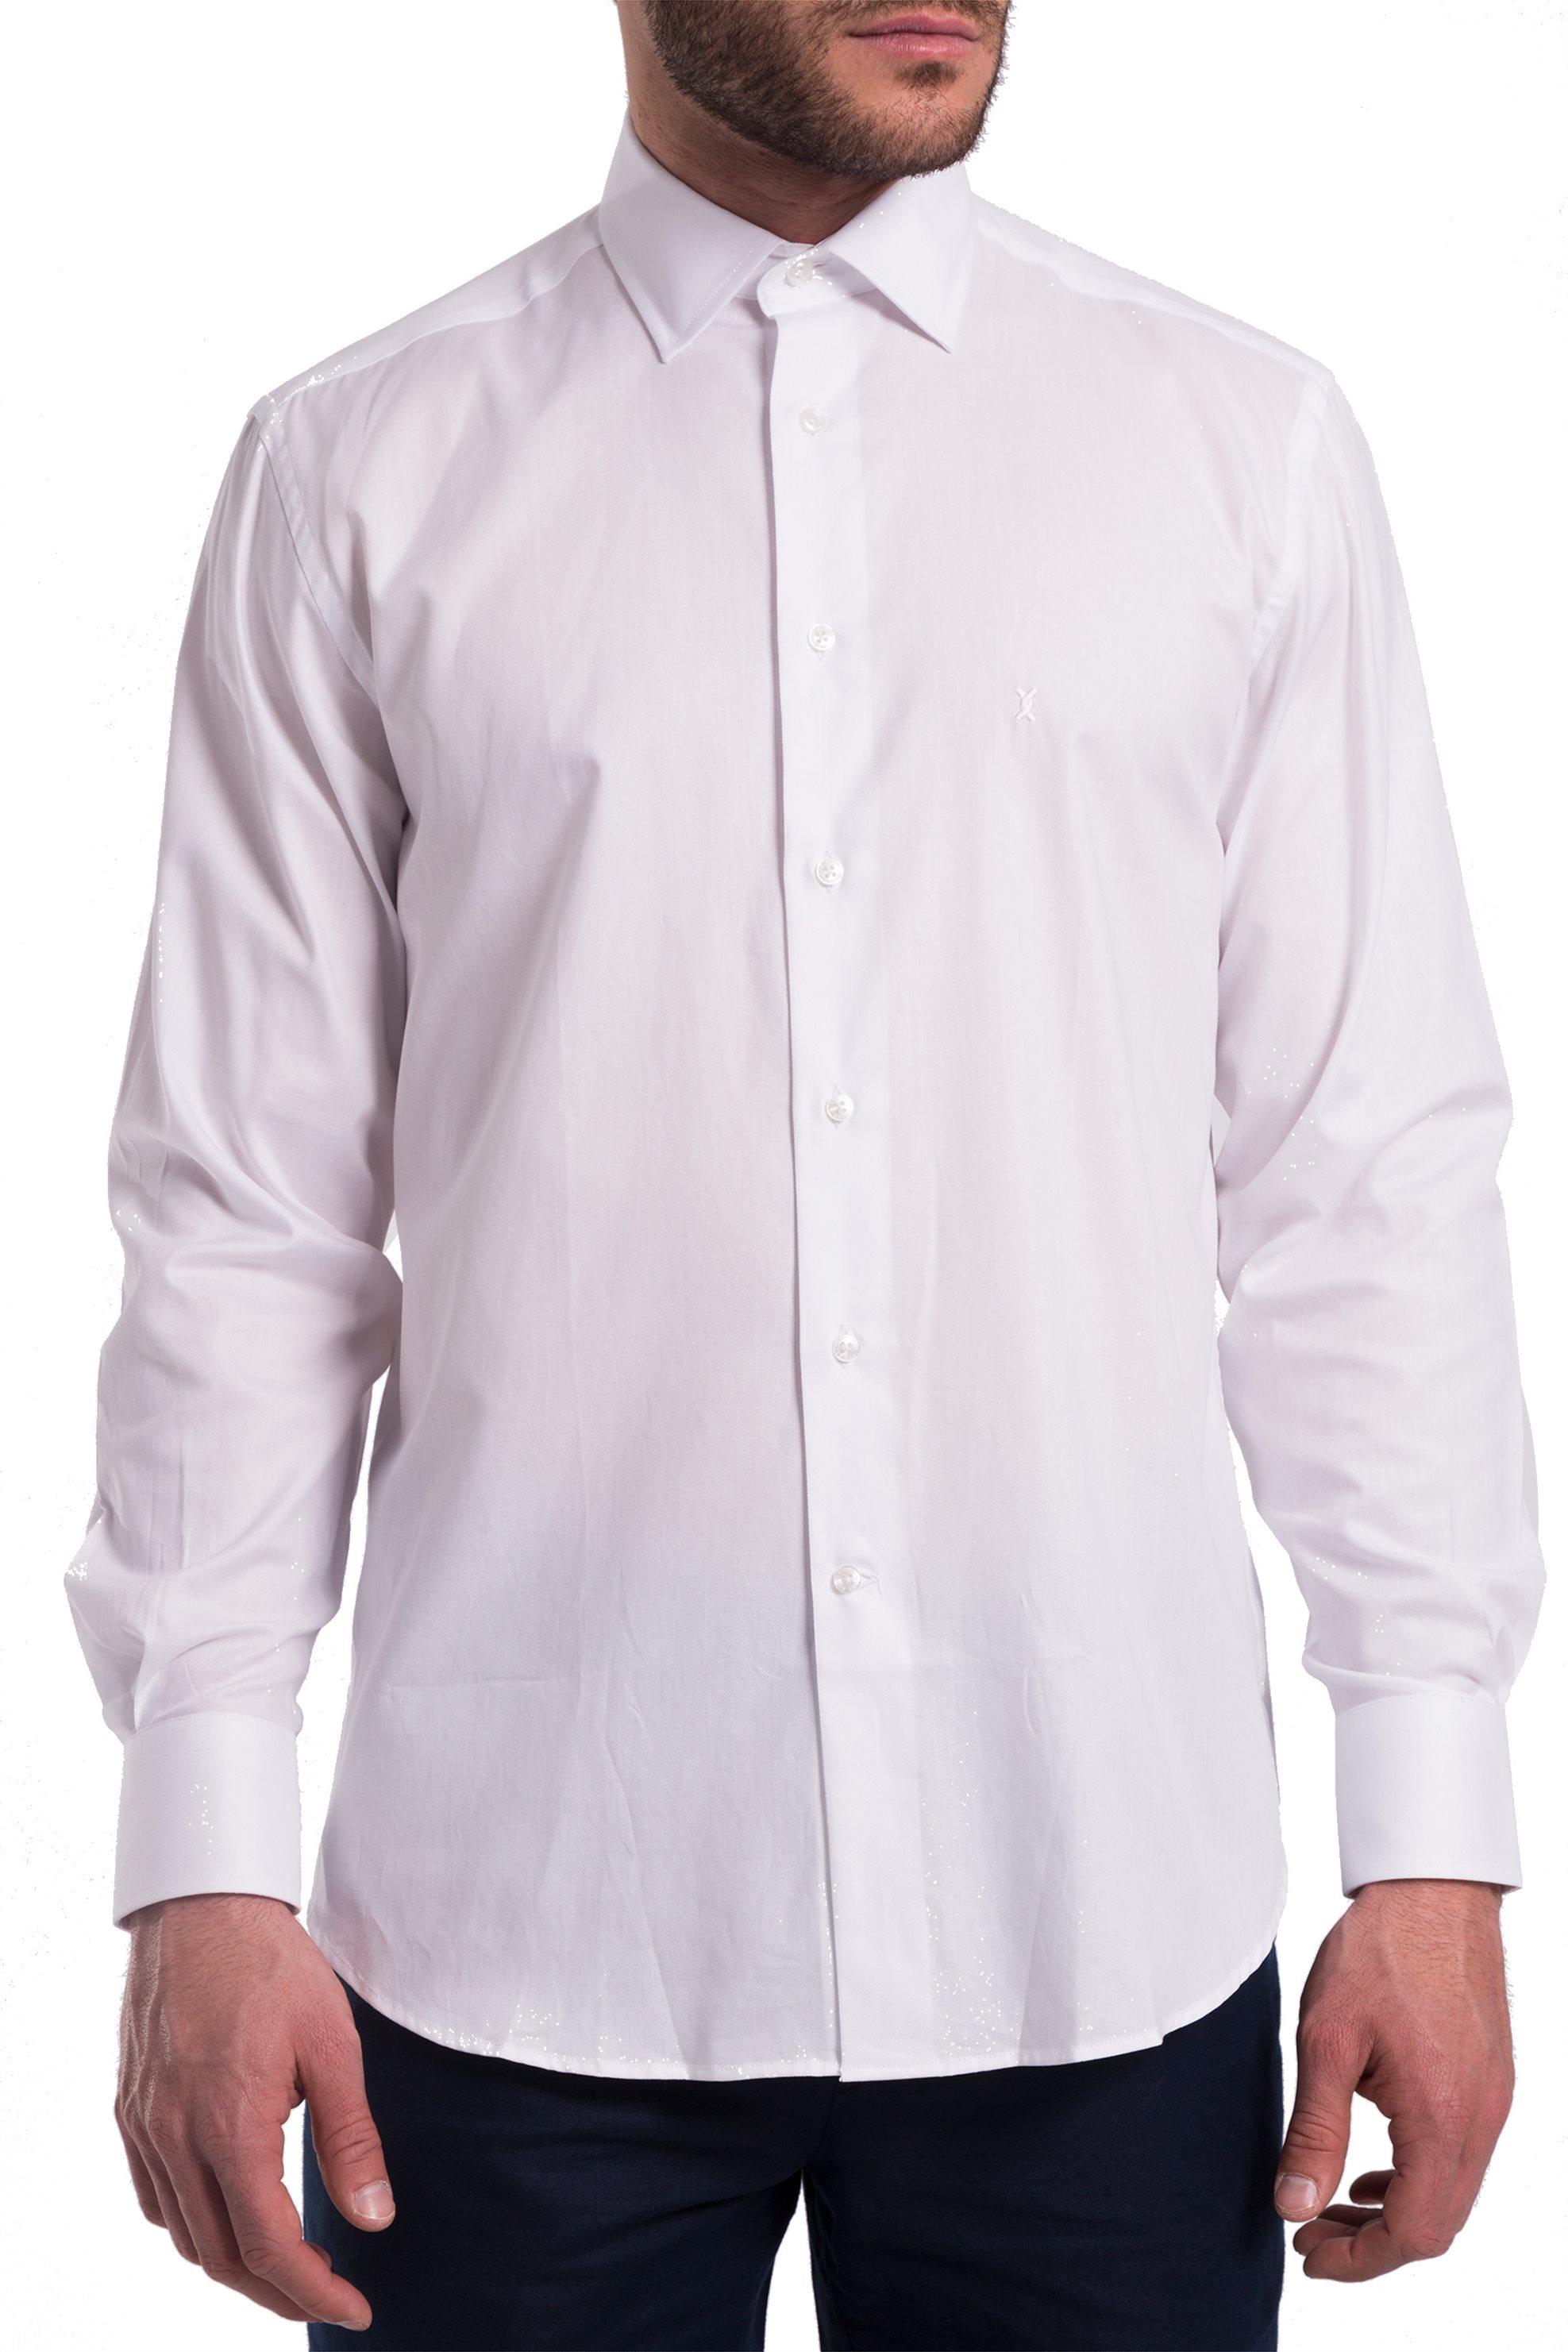 The Bostonians ανδρικό πουκάμισο μονόχρωμο με μακρύ μανίκι (sizes 39-46) - A8P0161 - Άσπρο